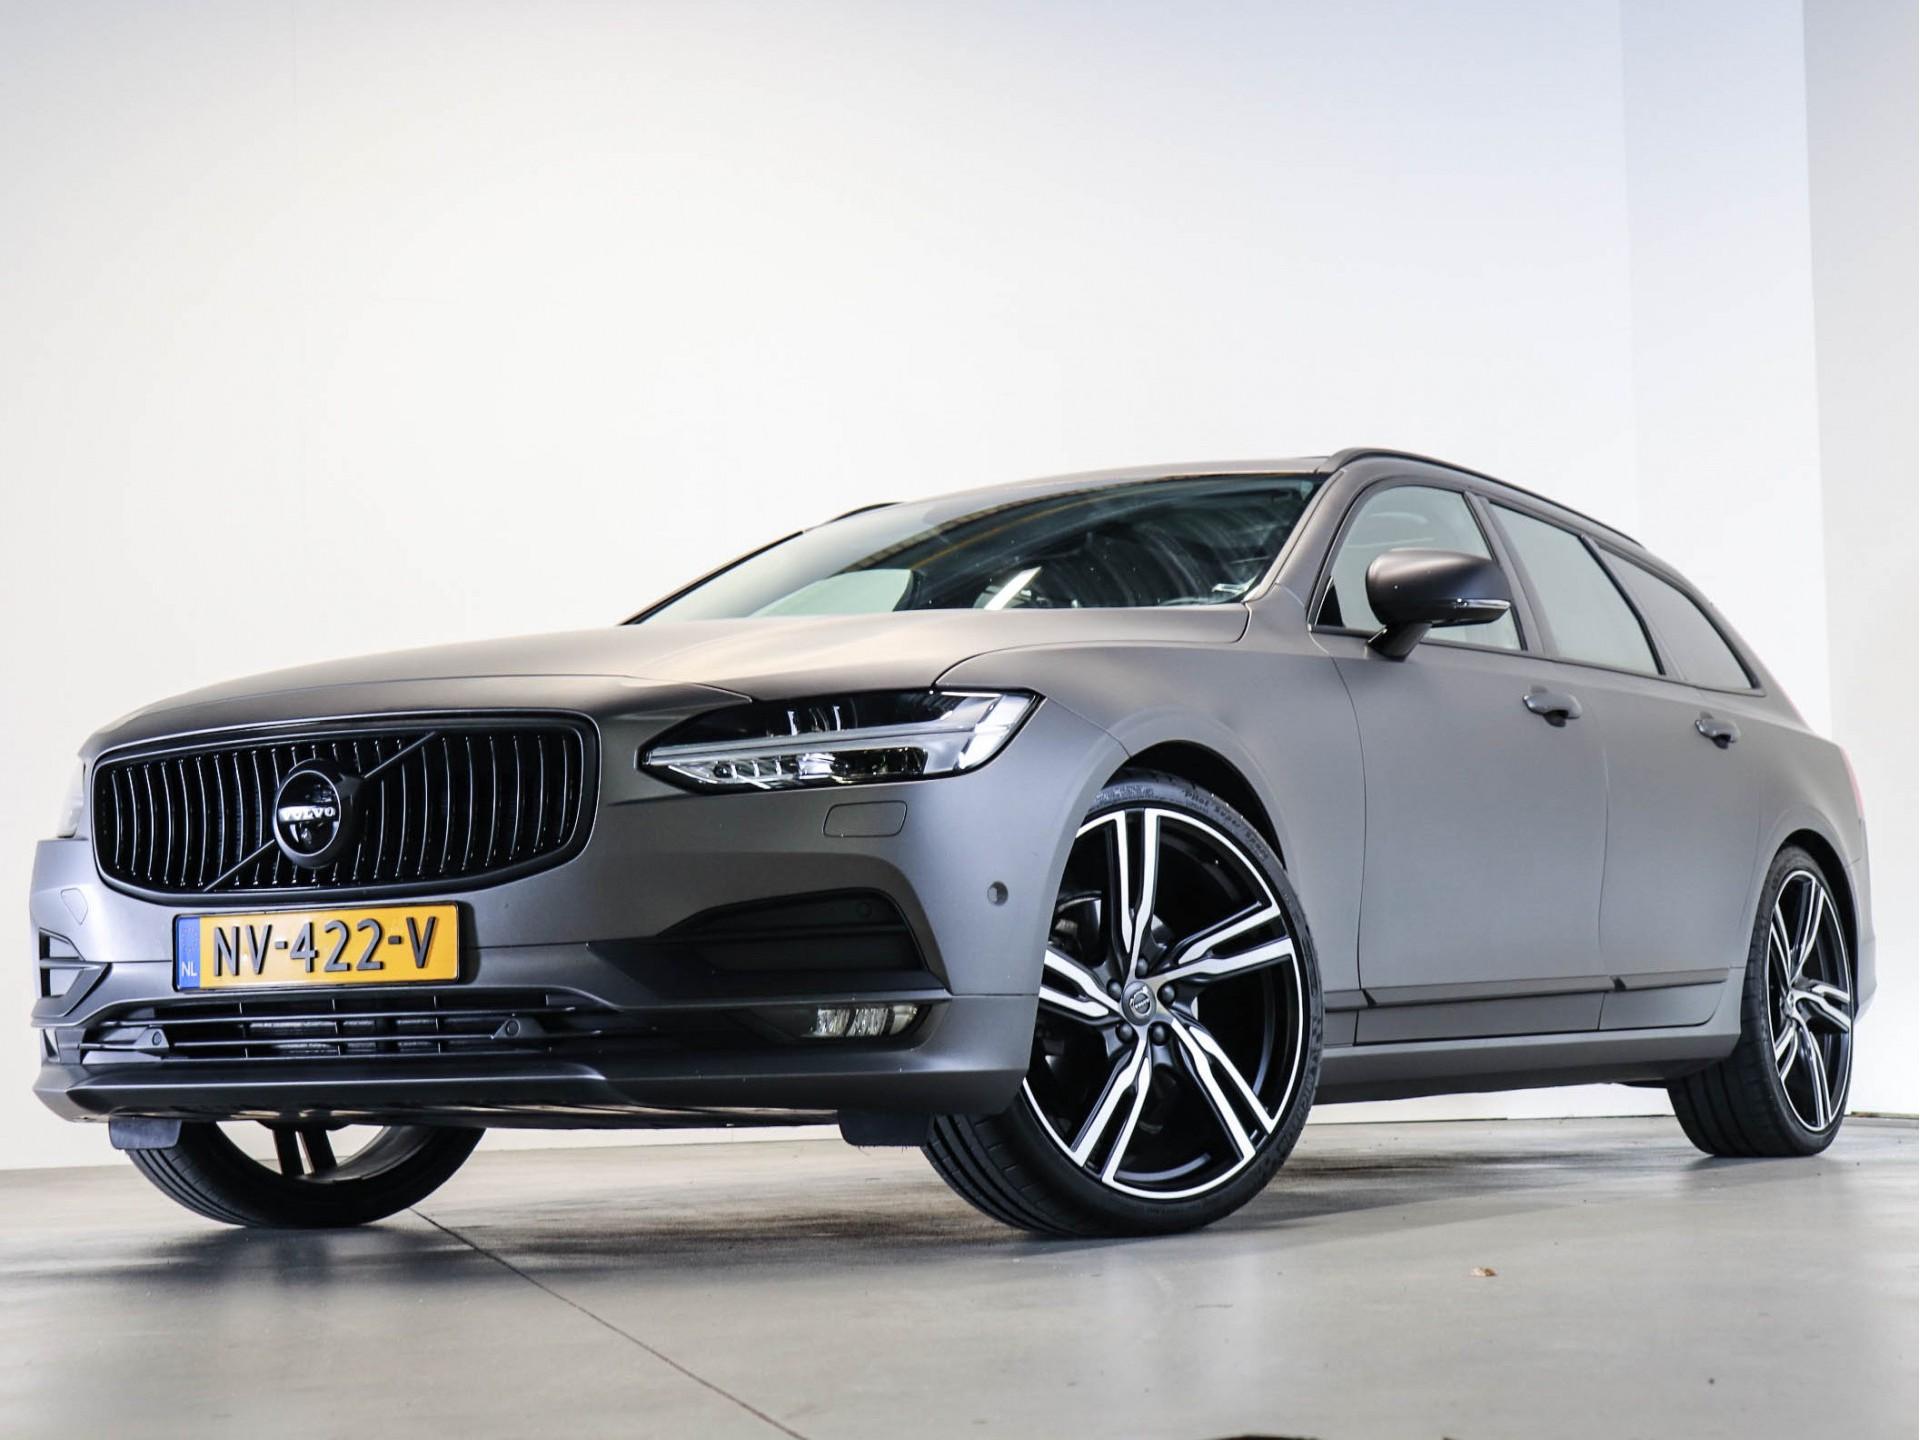 tweedehands, Volvo V90, occasion